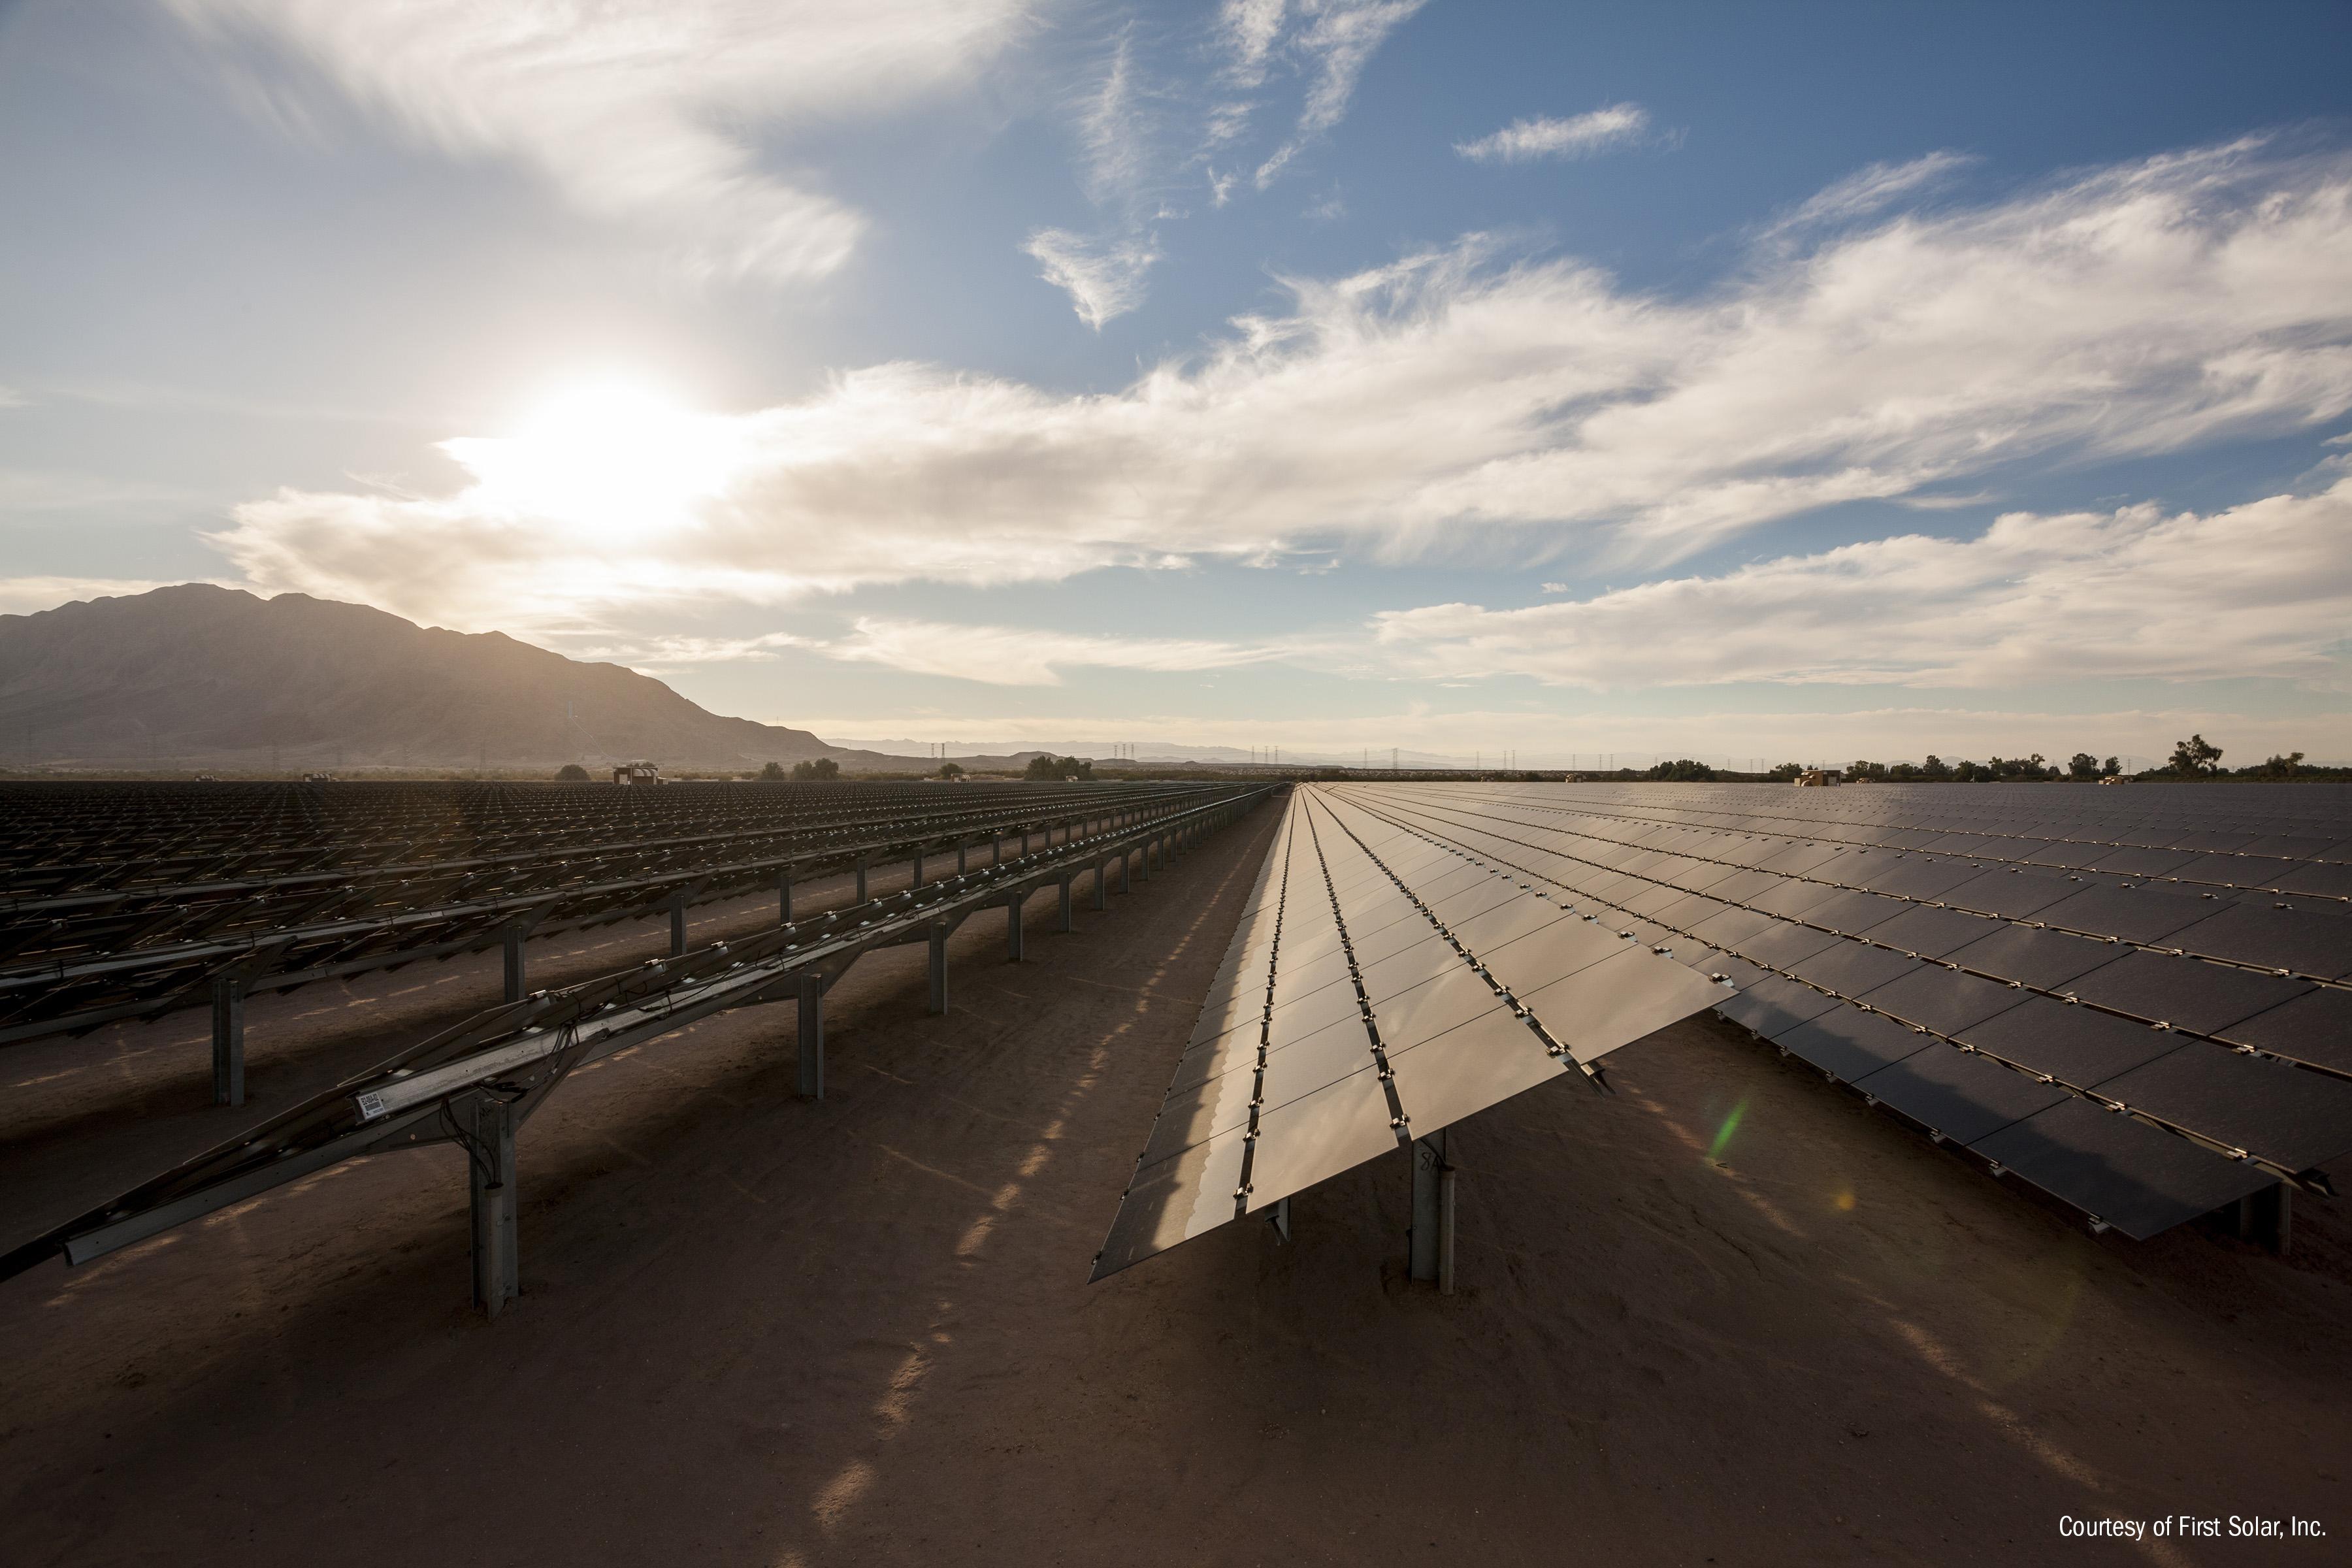 First Solar installation in the desert.